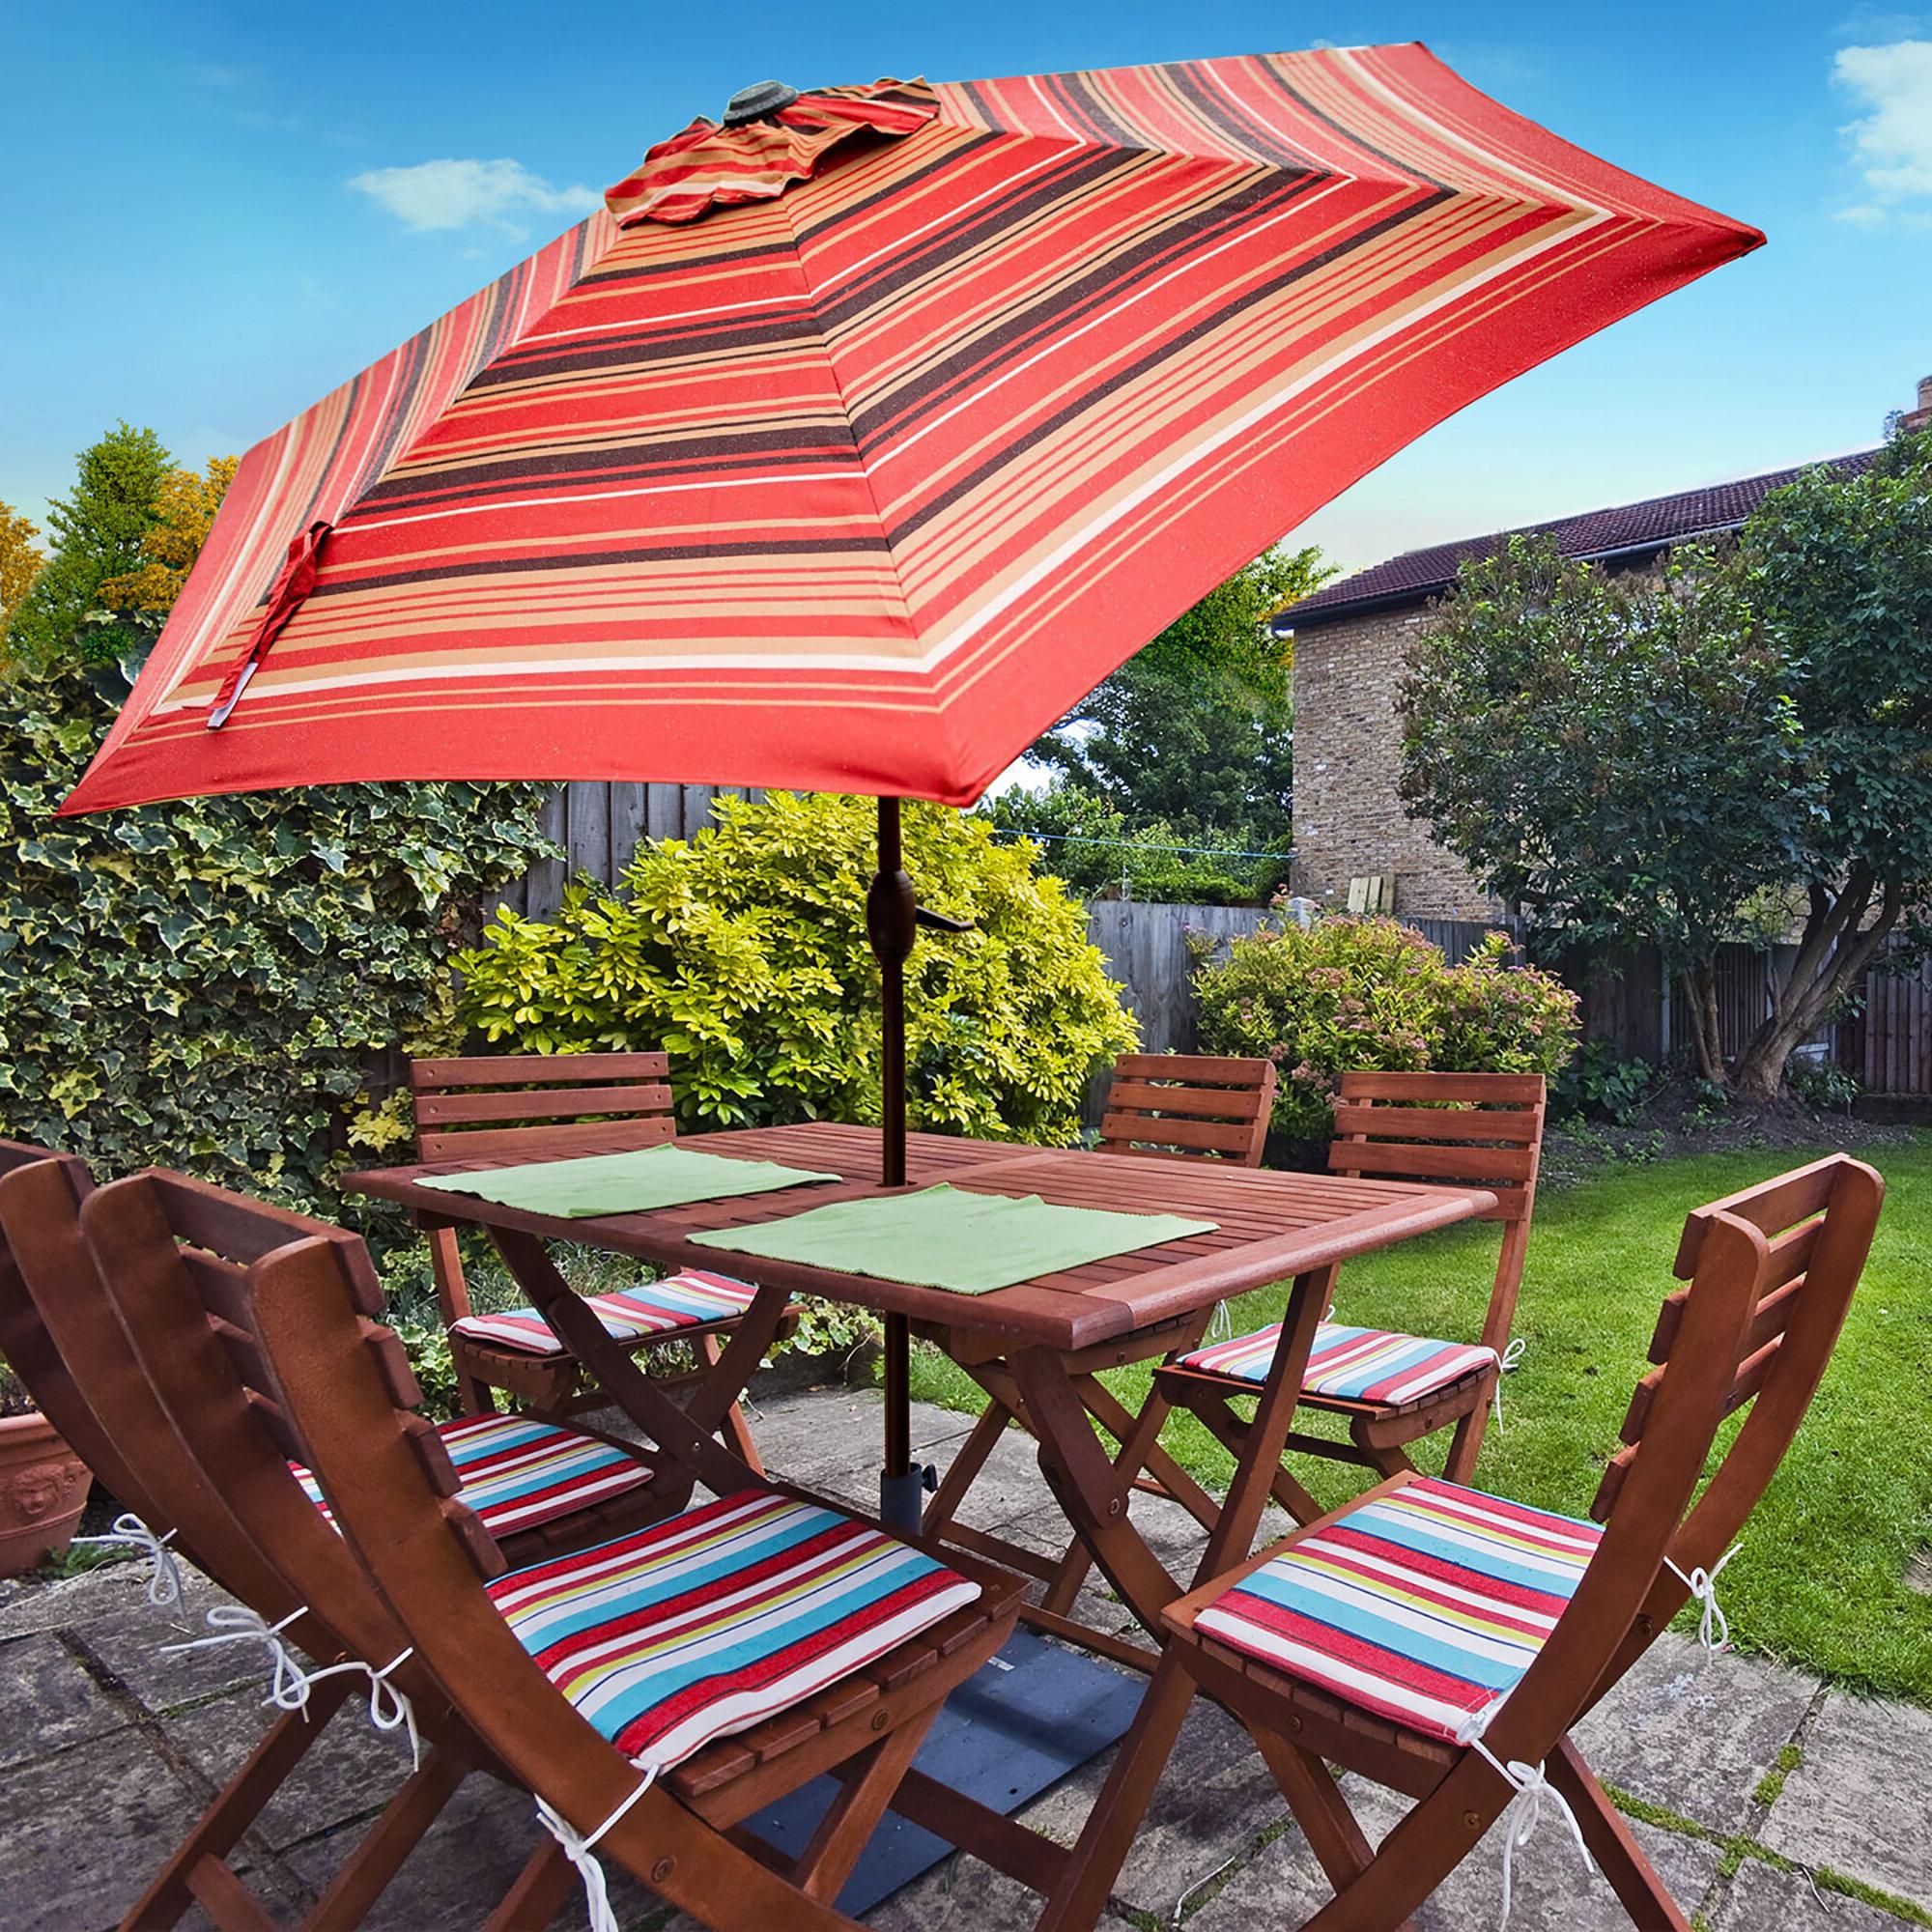 Folkeste 9' Market Umbrella In Popular Filey Market Umbrellas (View 4 of 20)